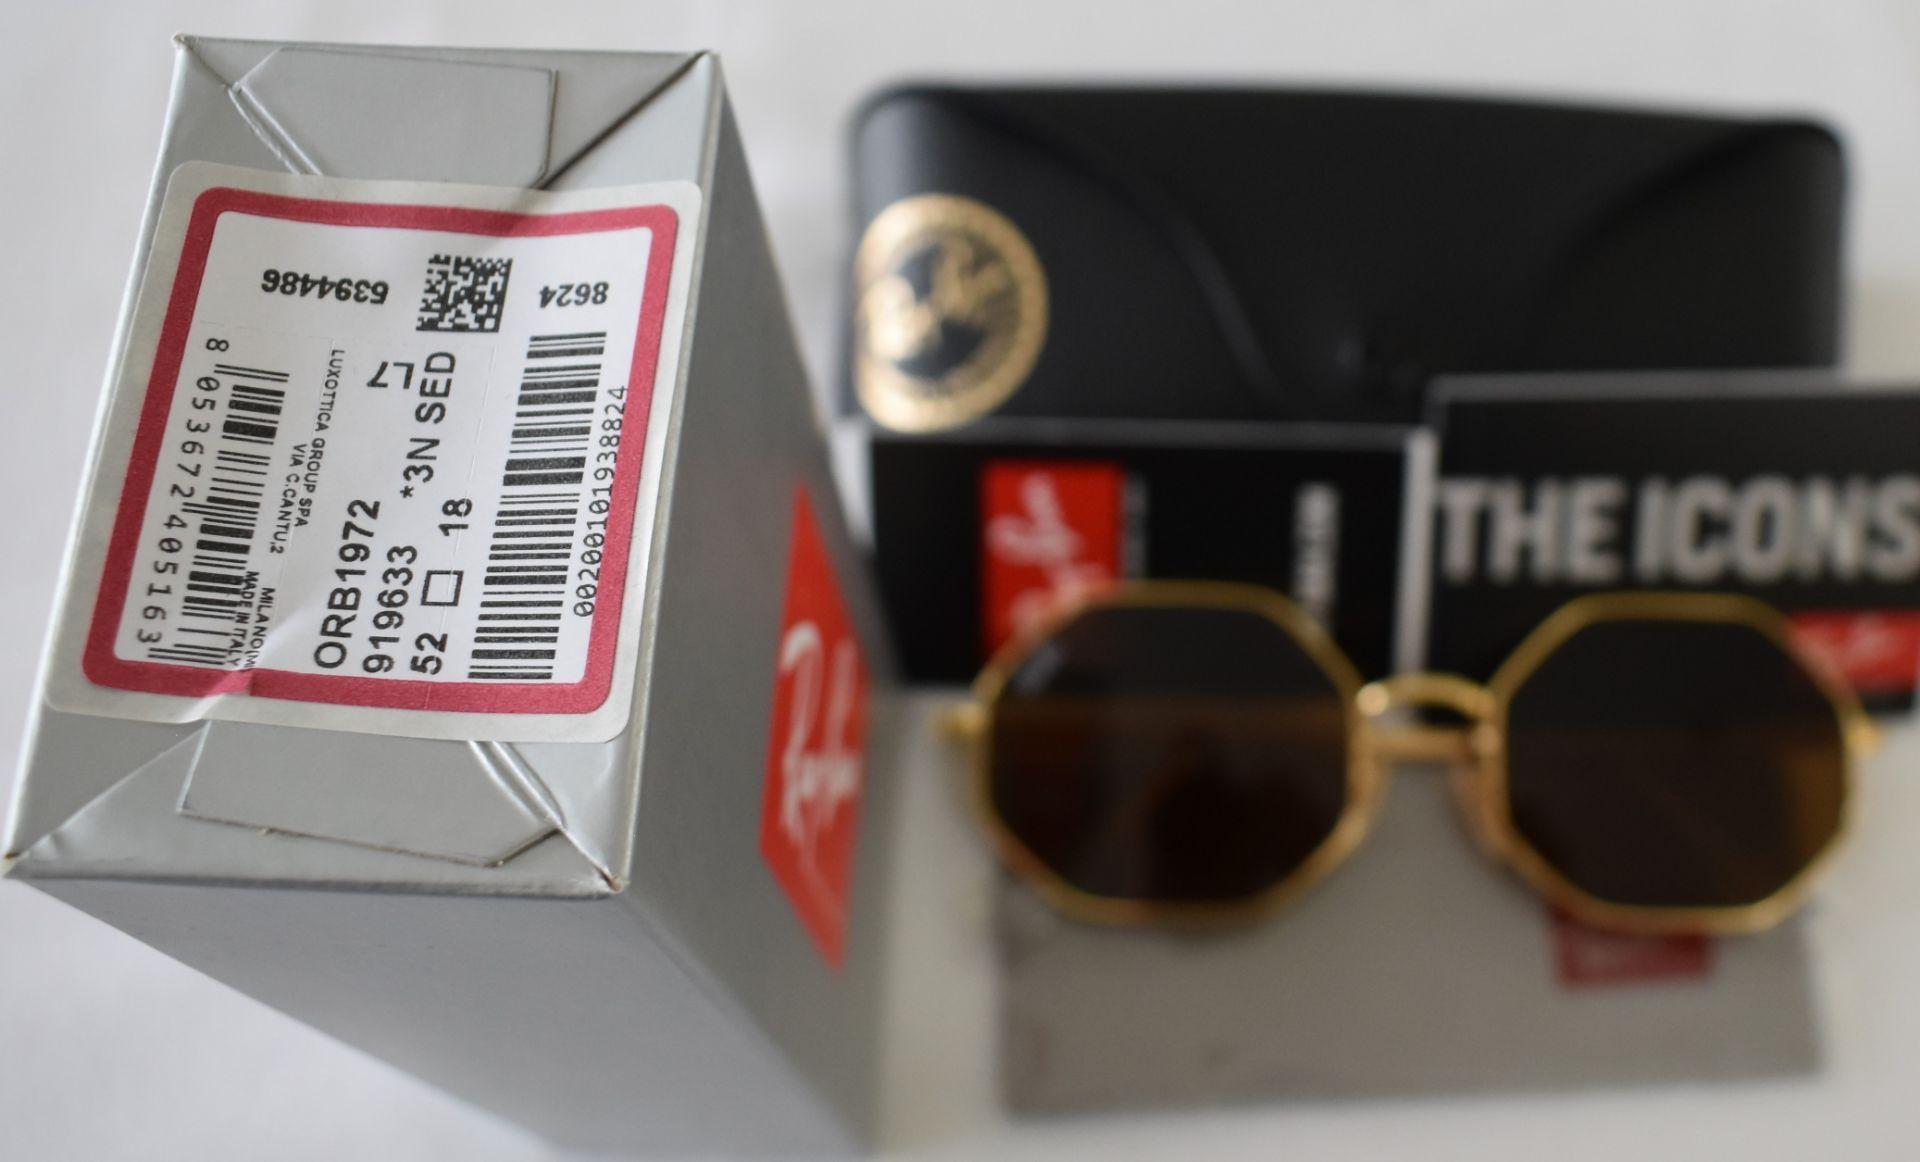 Ray Ban Sunglasses ORB1972 919633 *3N - Image 2 of 2